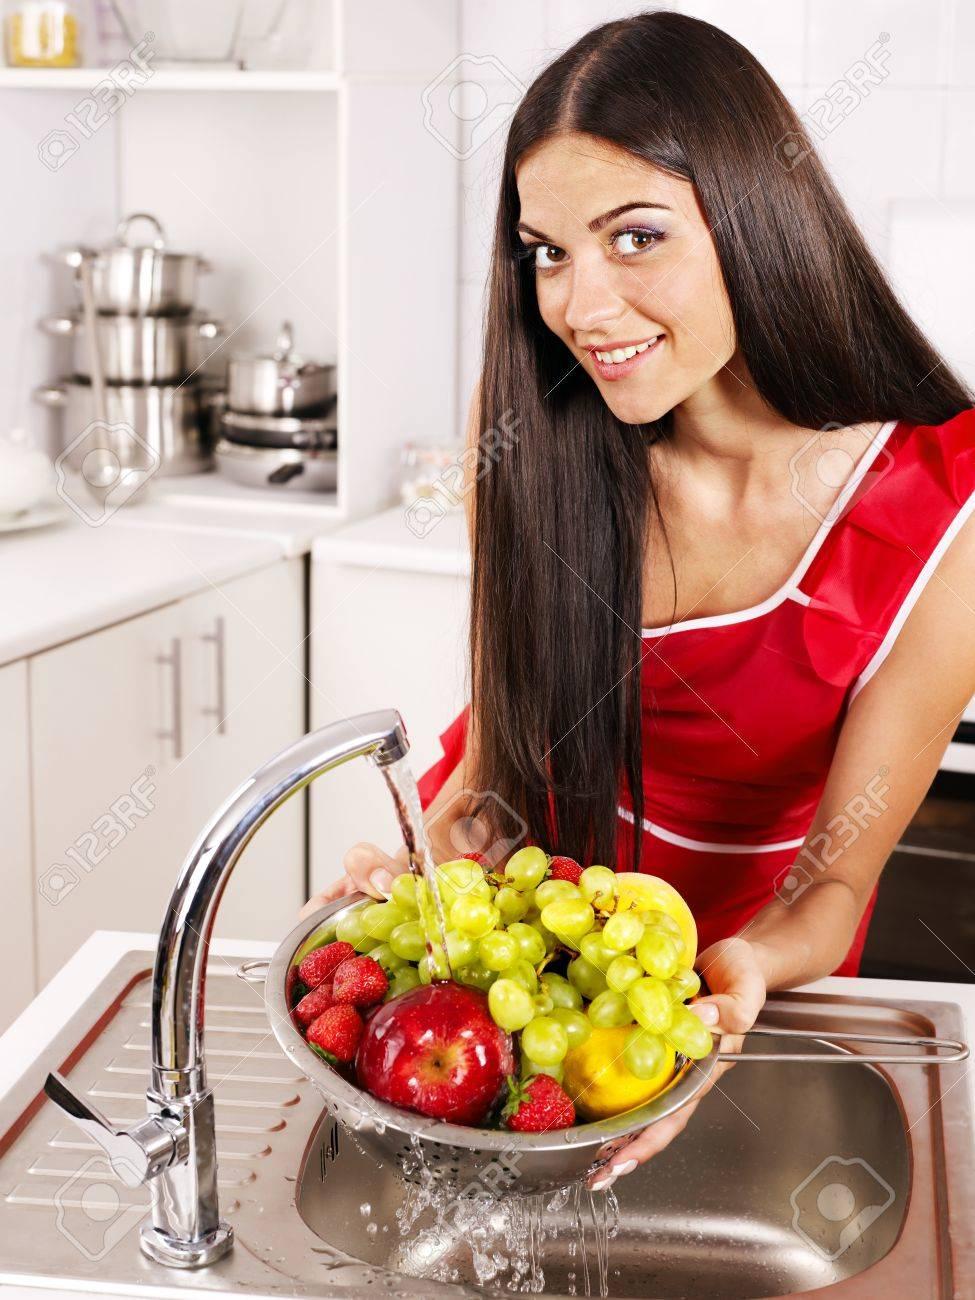 Happy woman washing fruit at kitchen. Stock Photo - 21173863